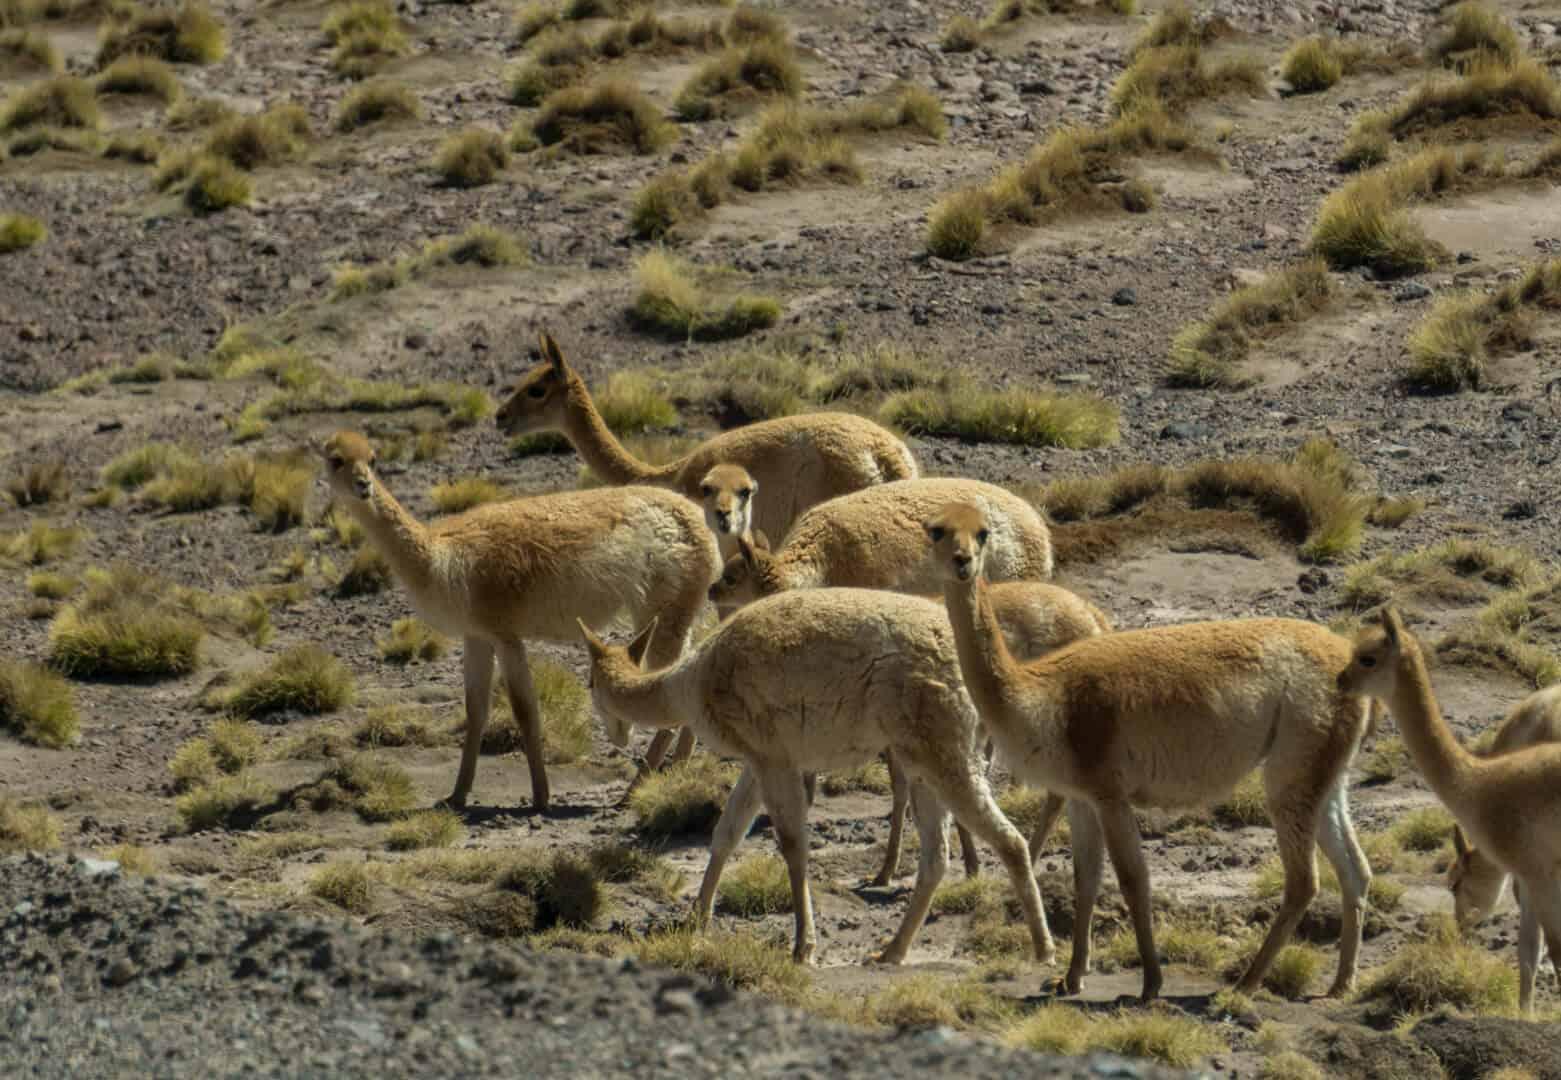 A pack of Vicuñas in the Atacama desert